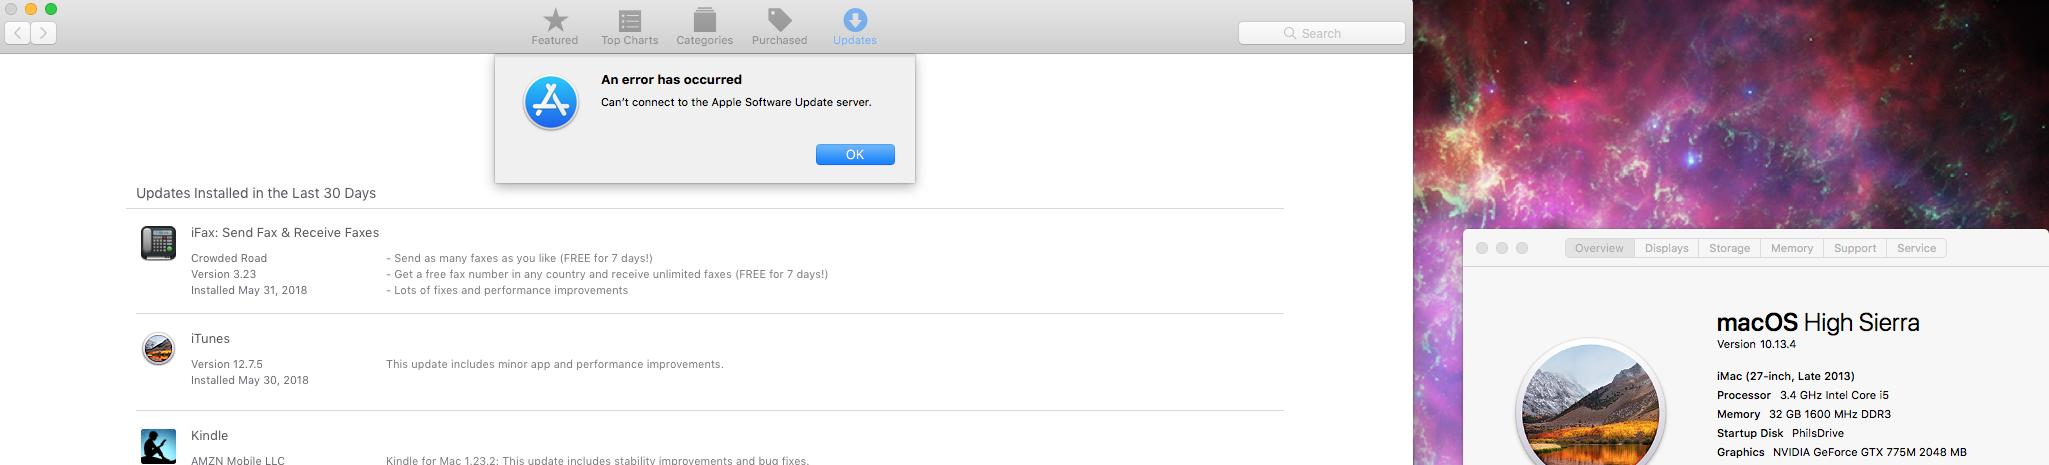 i cannot connect icloud drive, icloud ema… - Apple Community